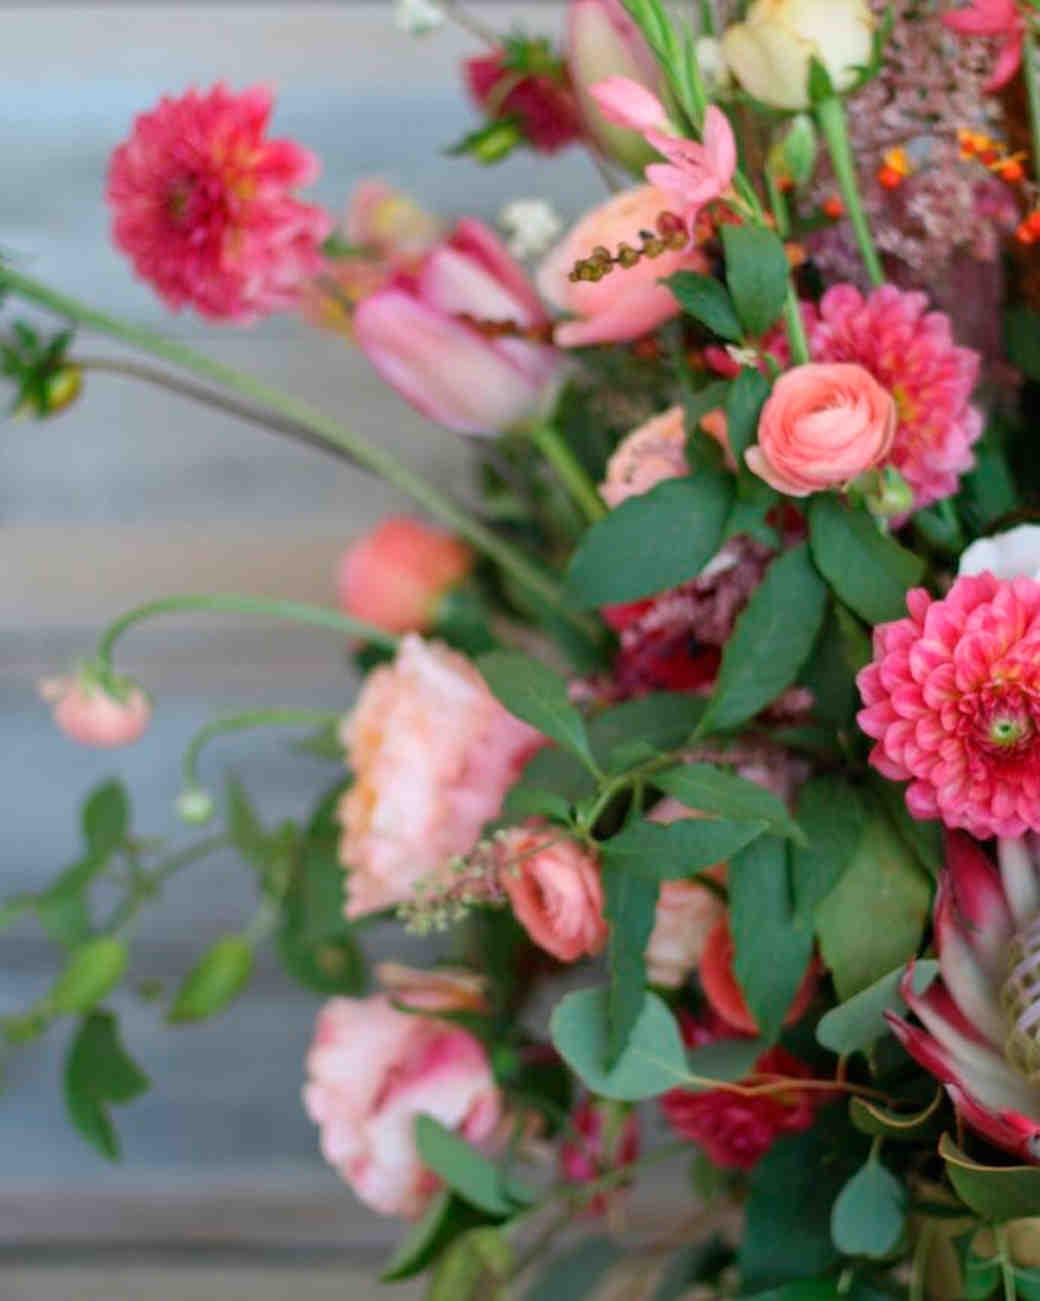 11 In Season Flowers That Are Perfect For A Fall Wedding   Martha Stewart  Weddings